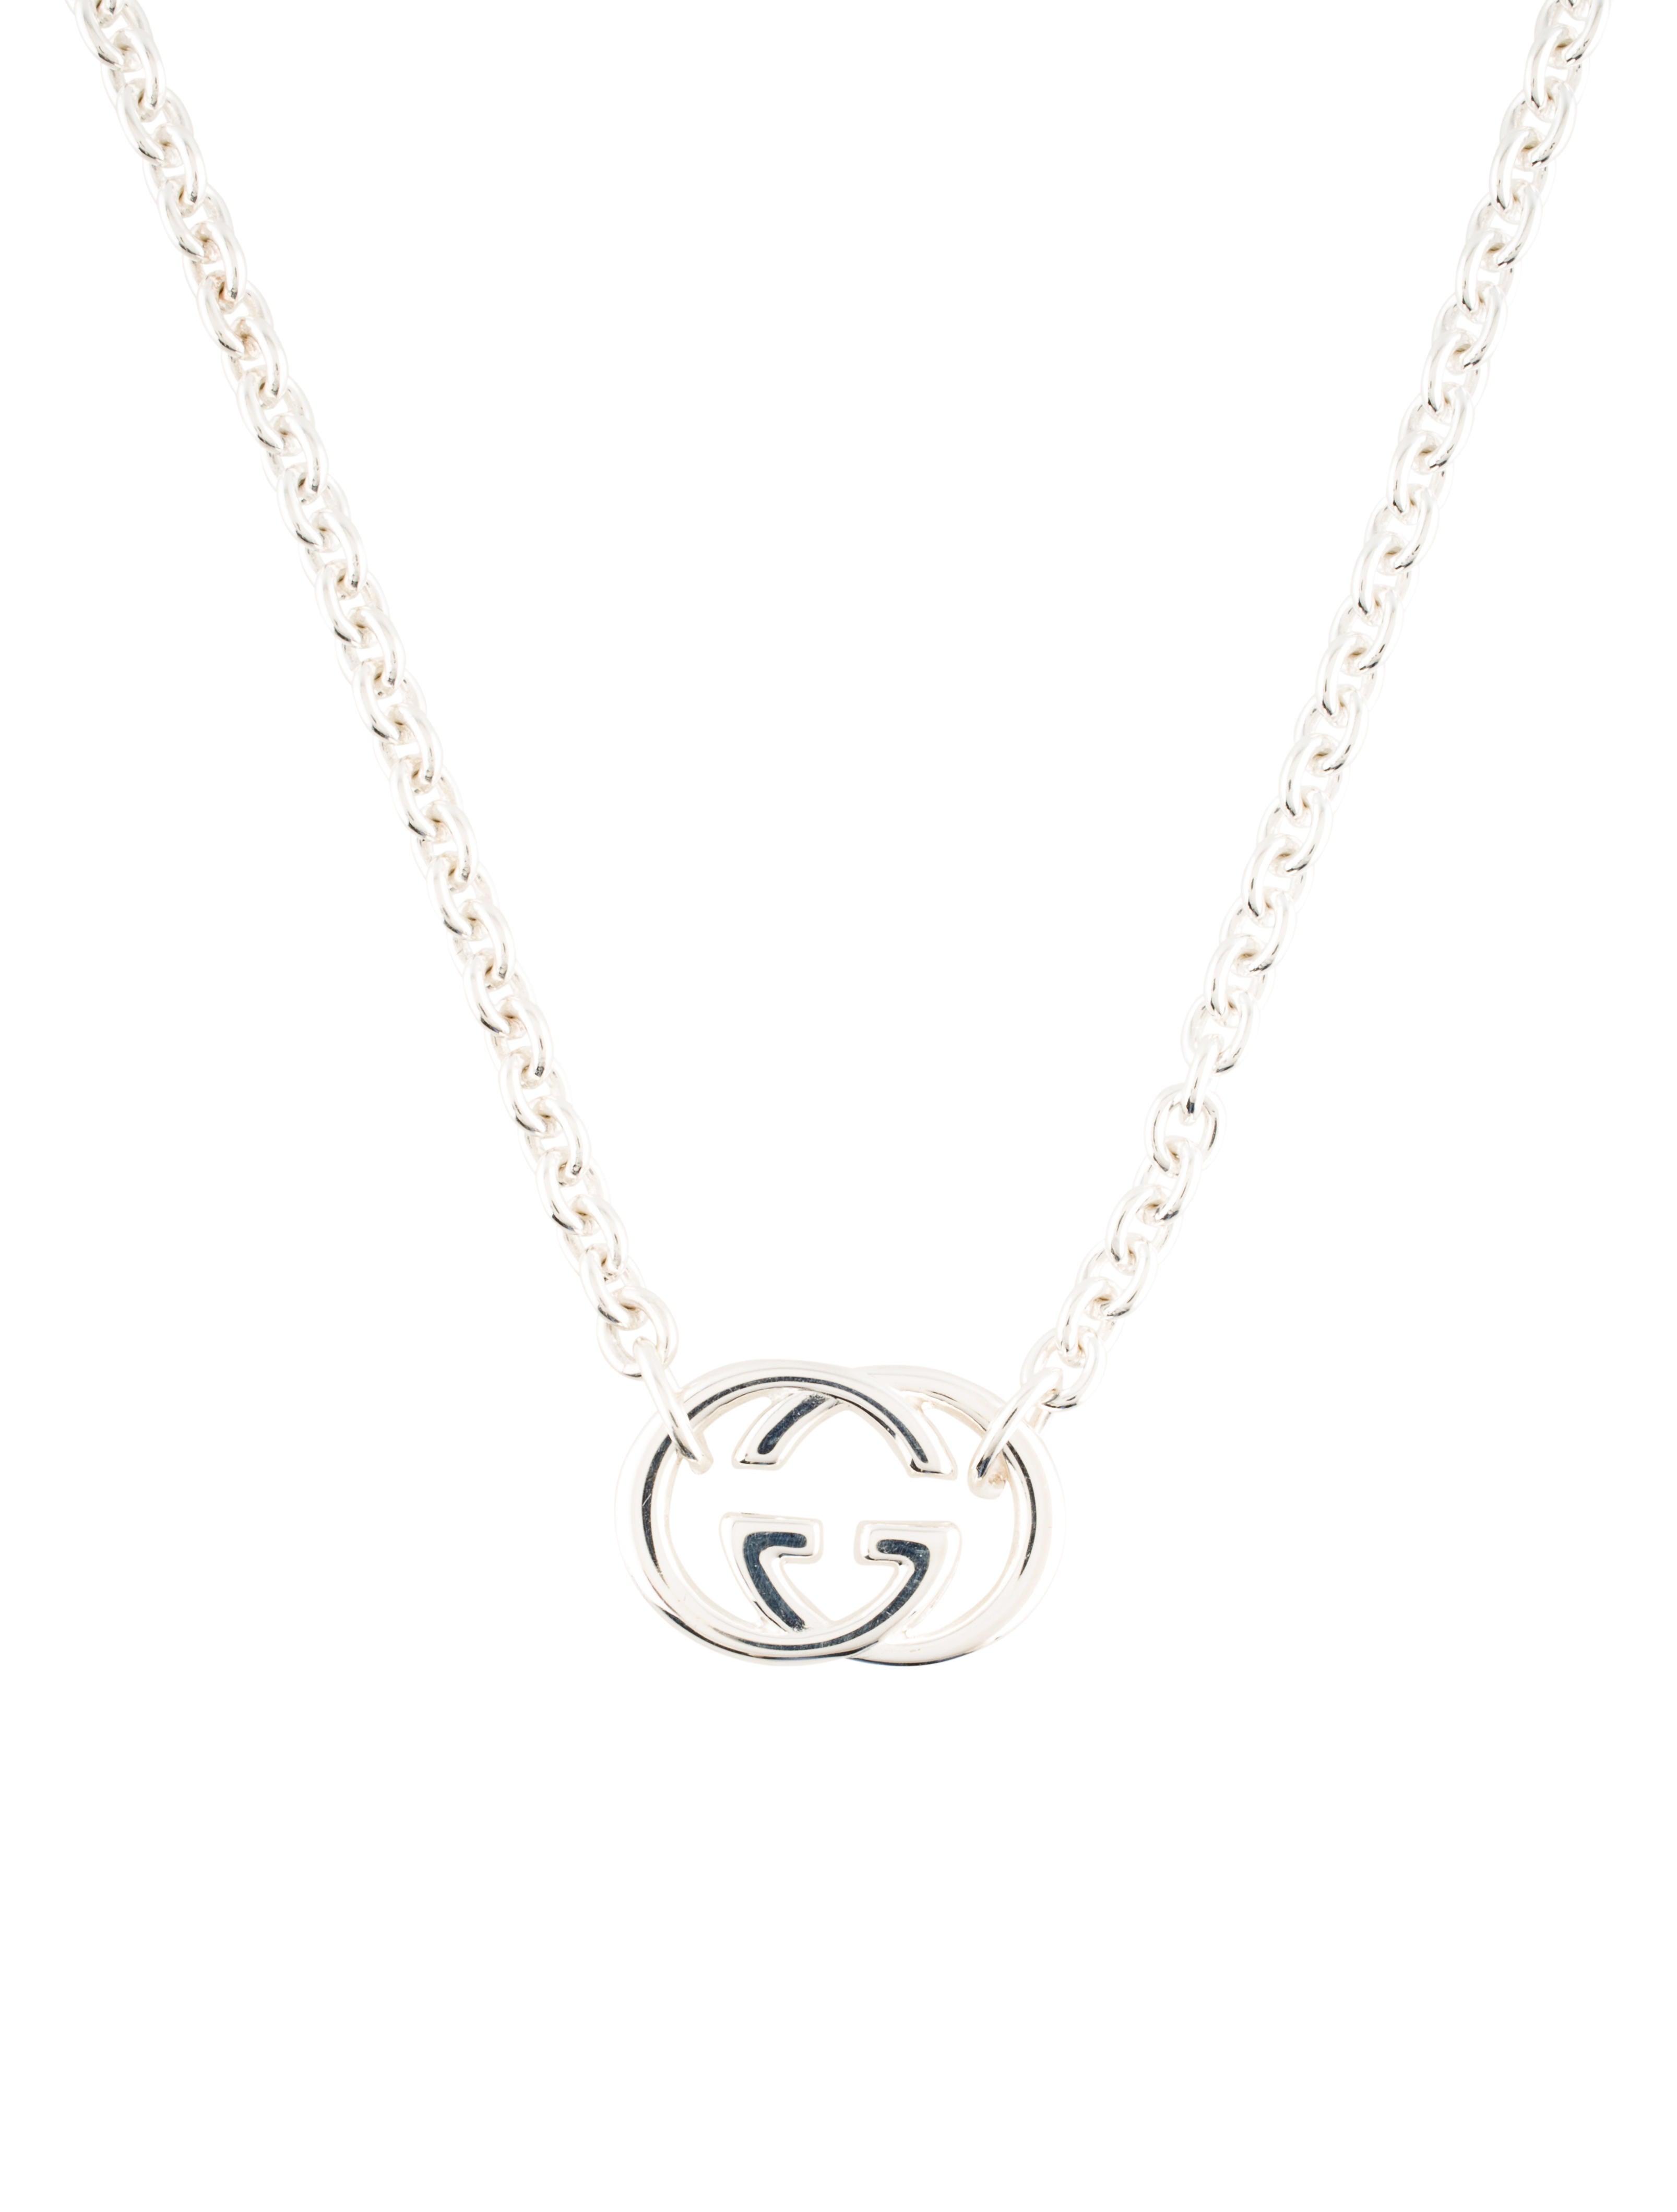 2d096b0214e02b Gucci Interlocking G Pendant Necklace - Necklaces - GUC72769 | The ...